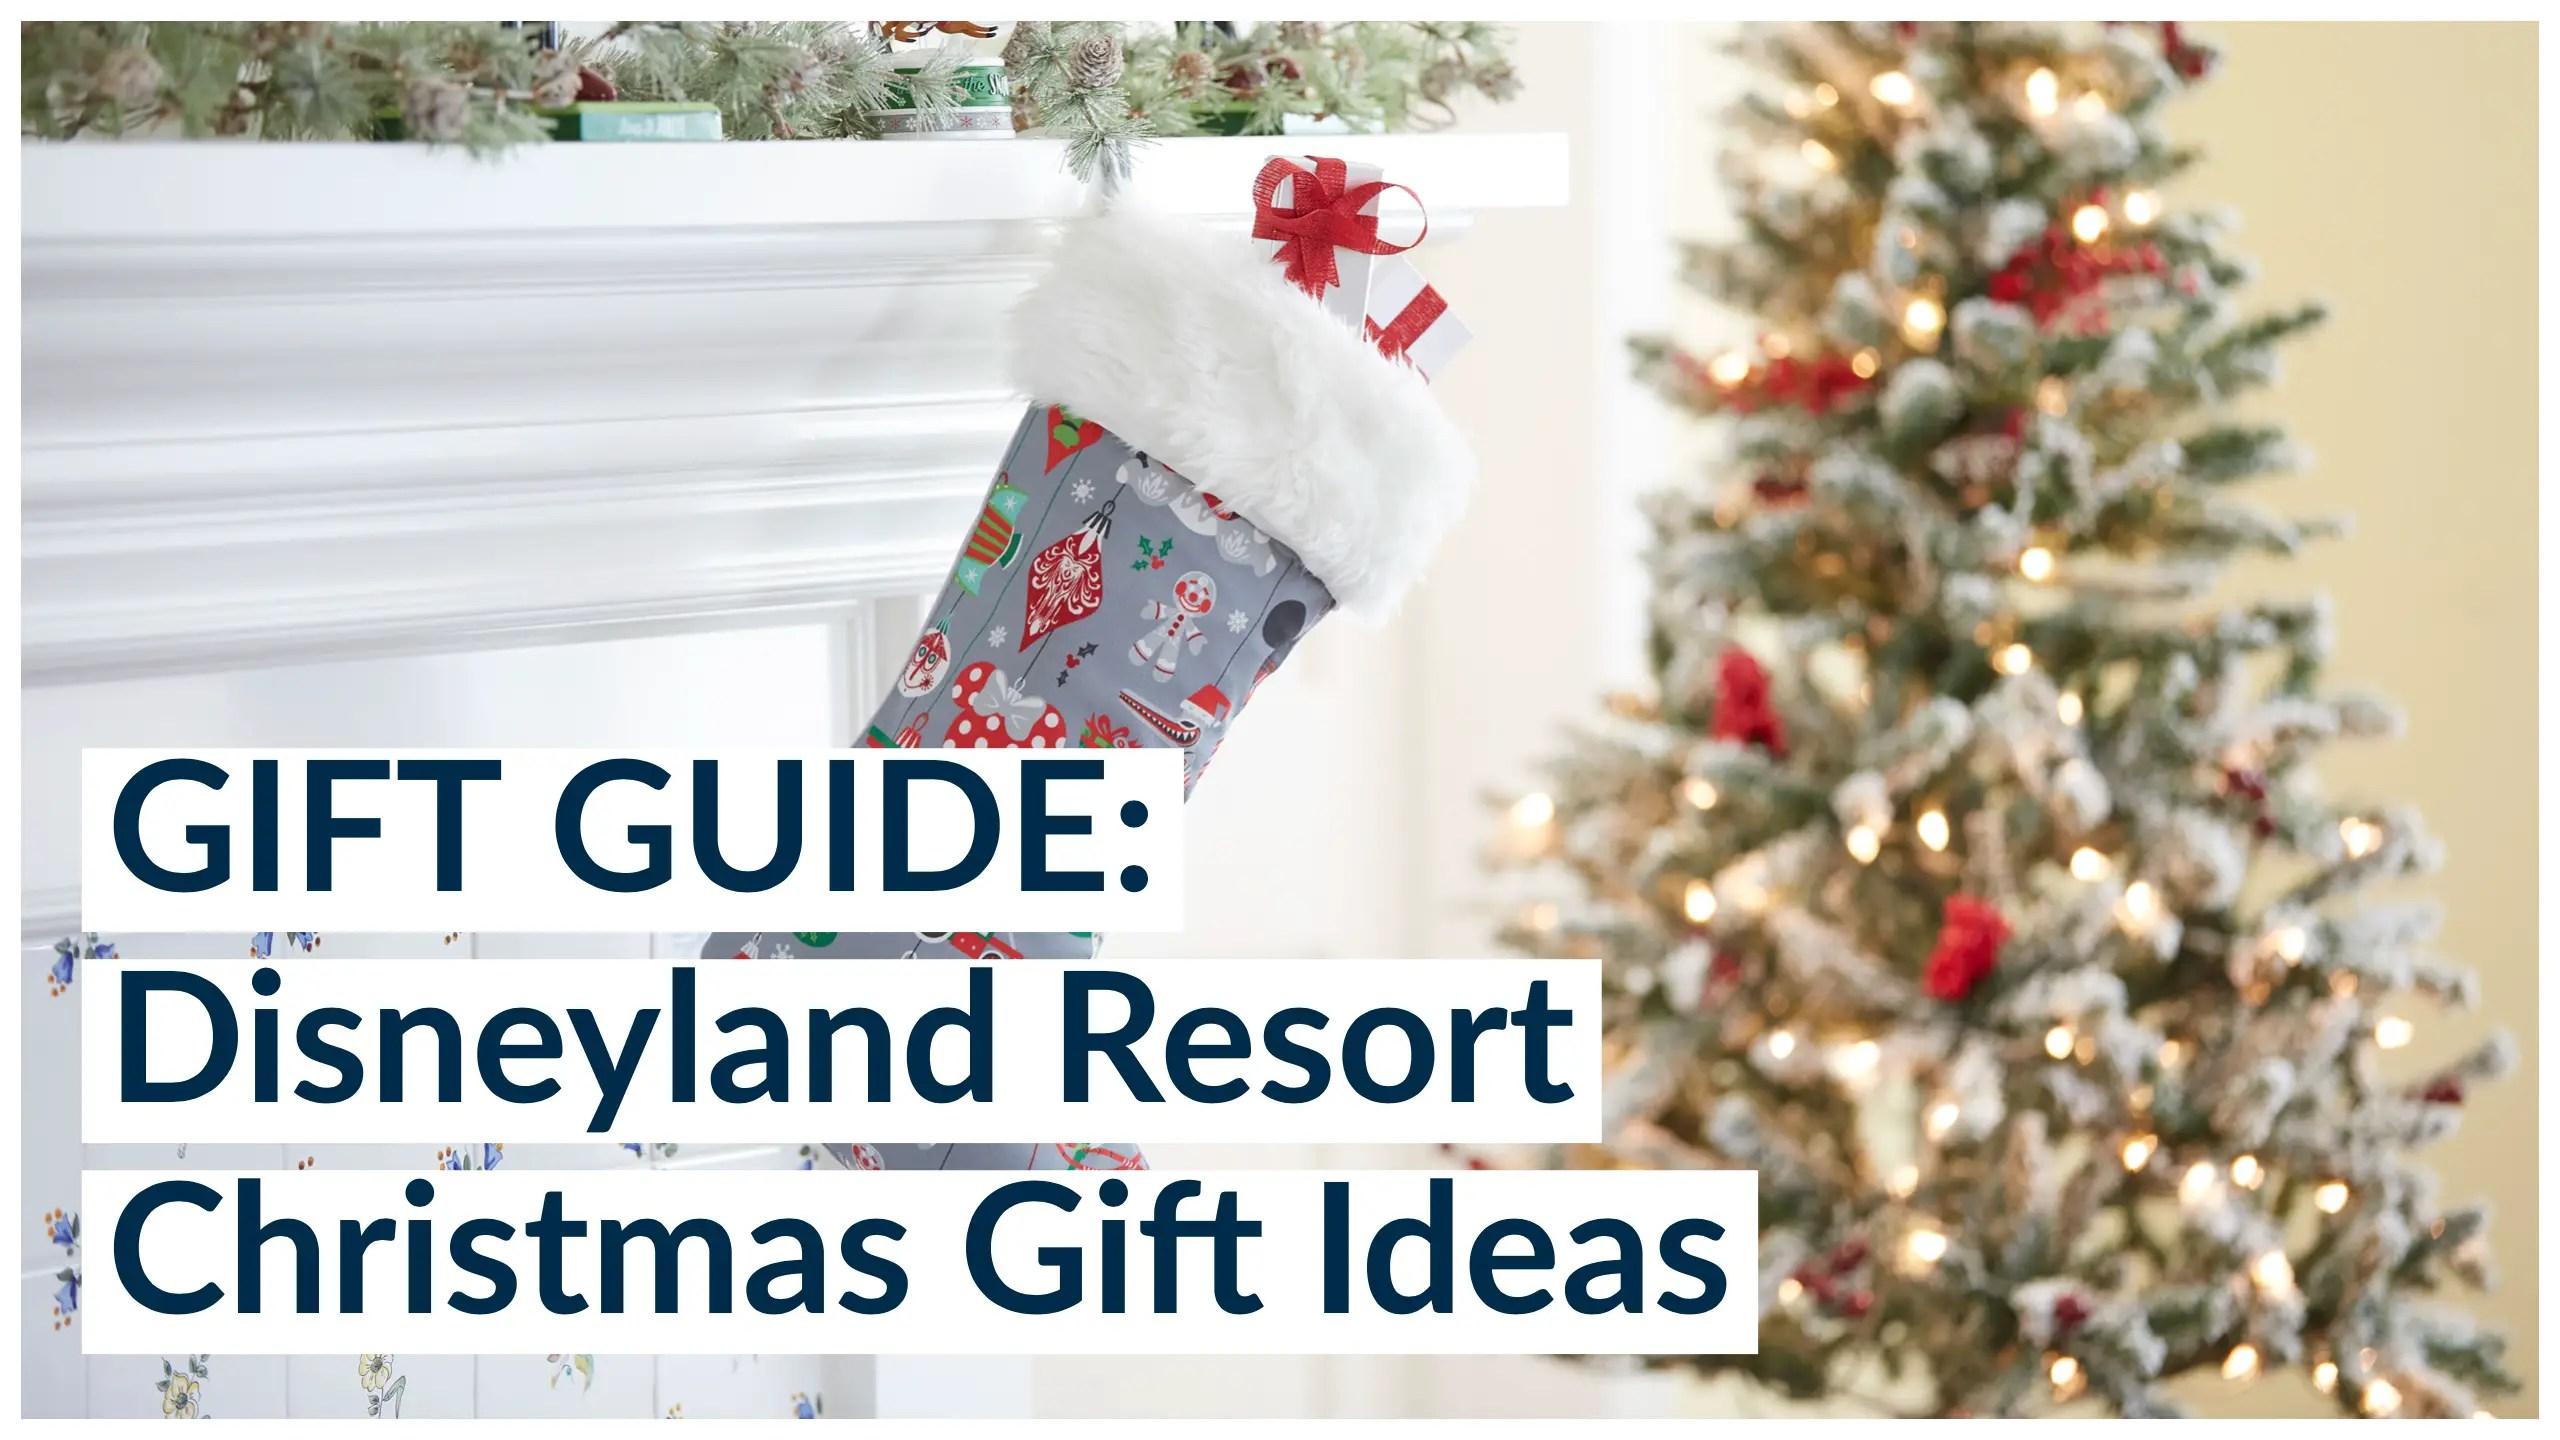 Gift Guide: Disneyland Resort Christmas Gift Ideas for Friends ...